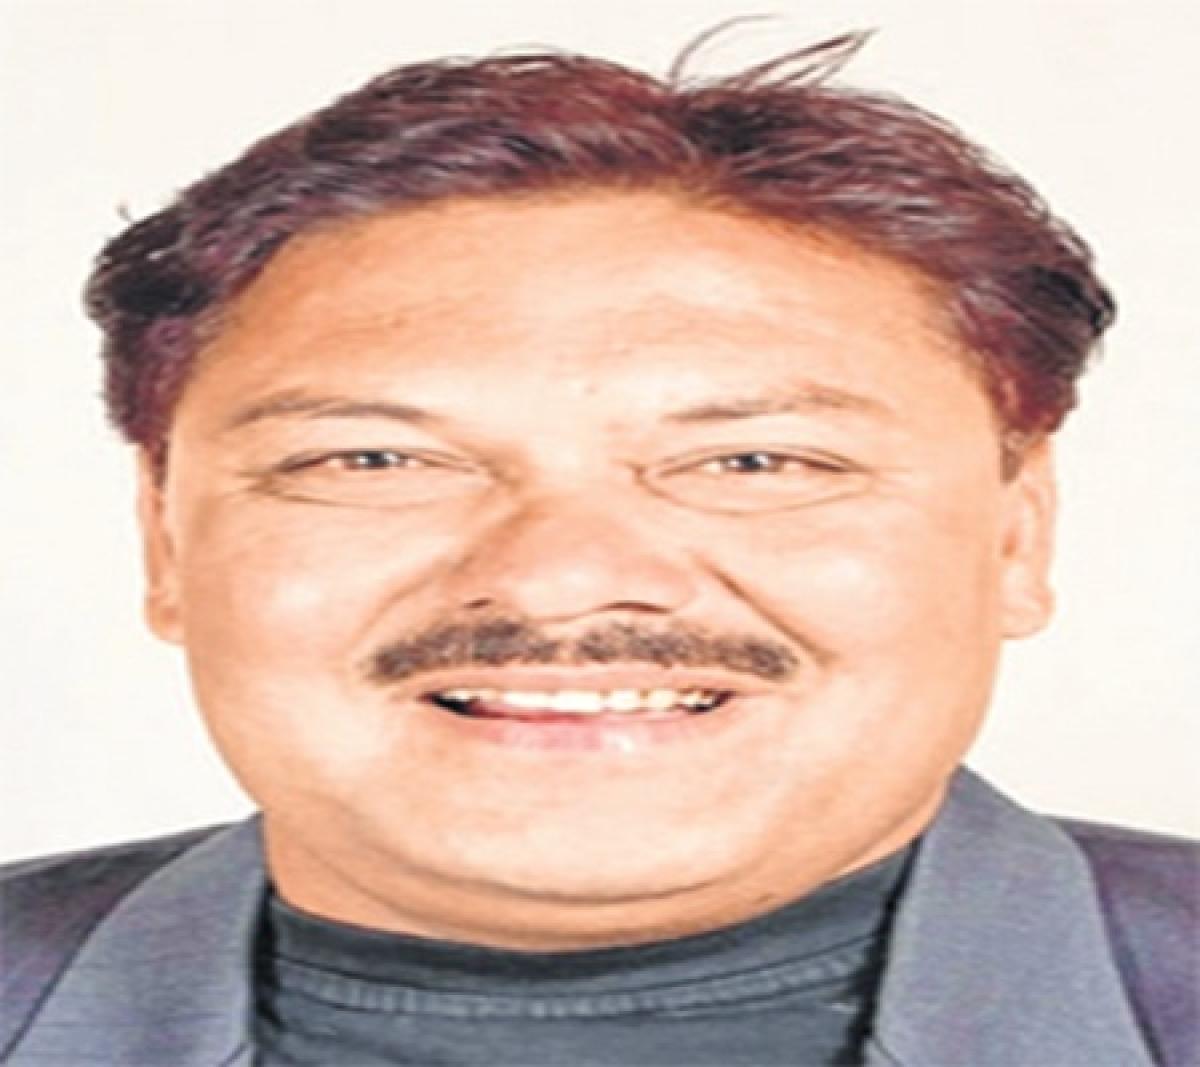 Ujjain: Vivek Joshi replaces Iqbal Singh Gandhi as city BJP chief